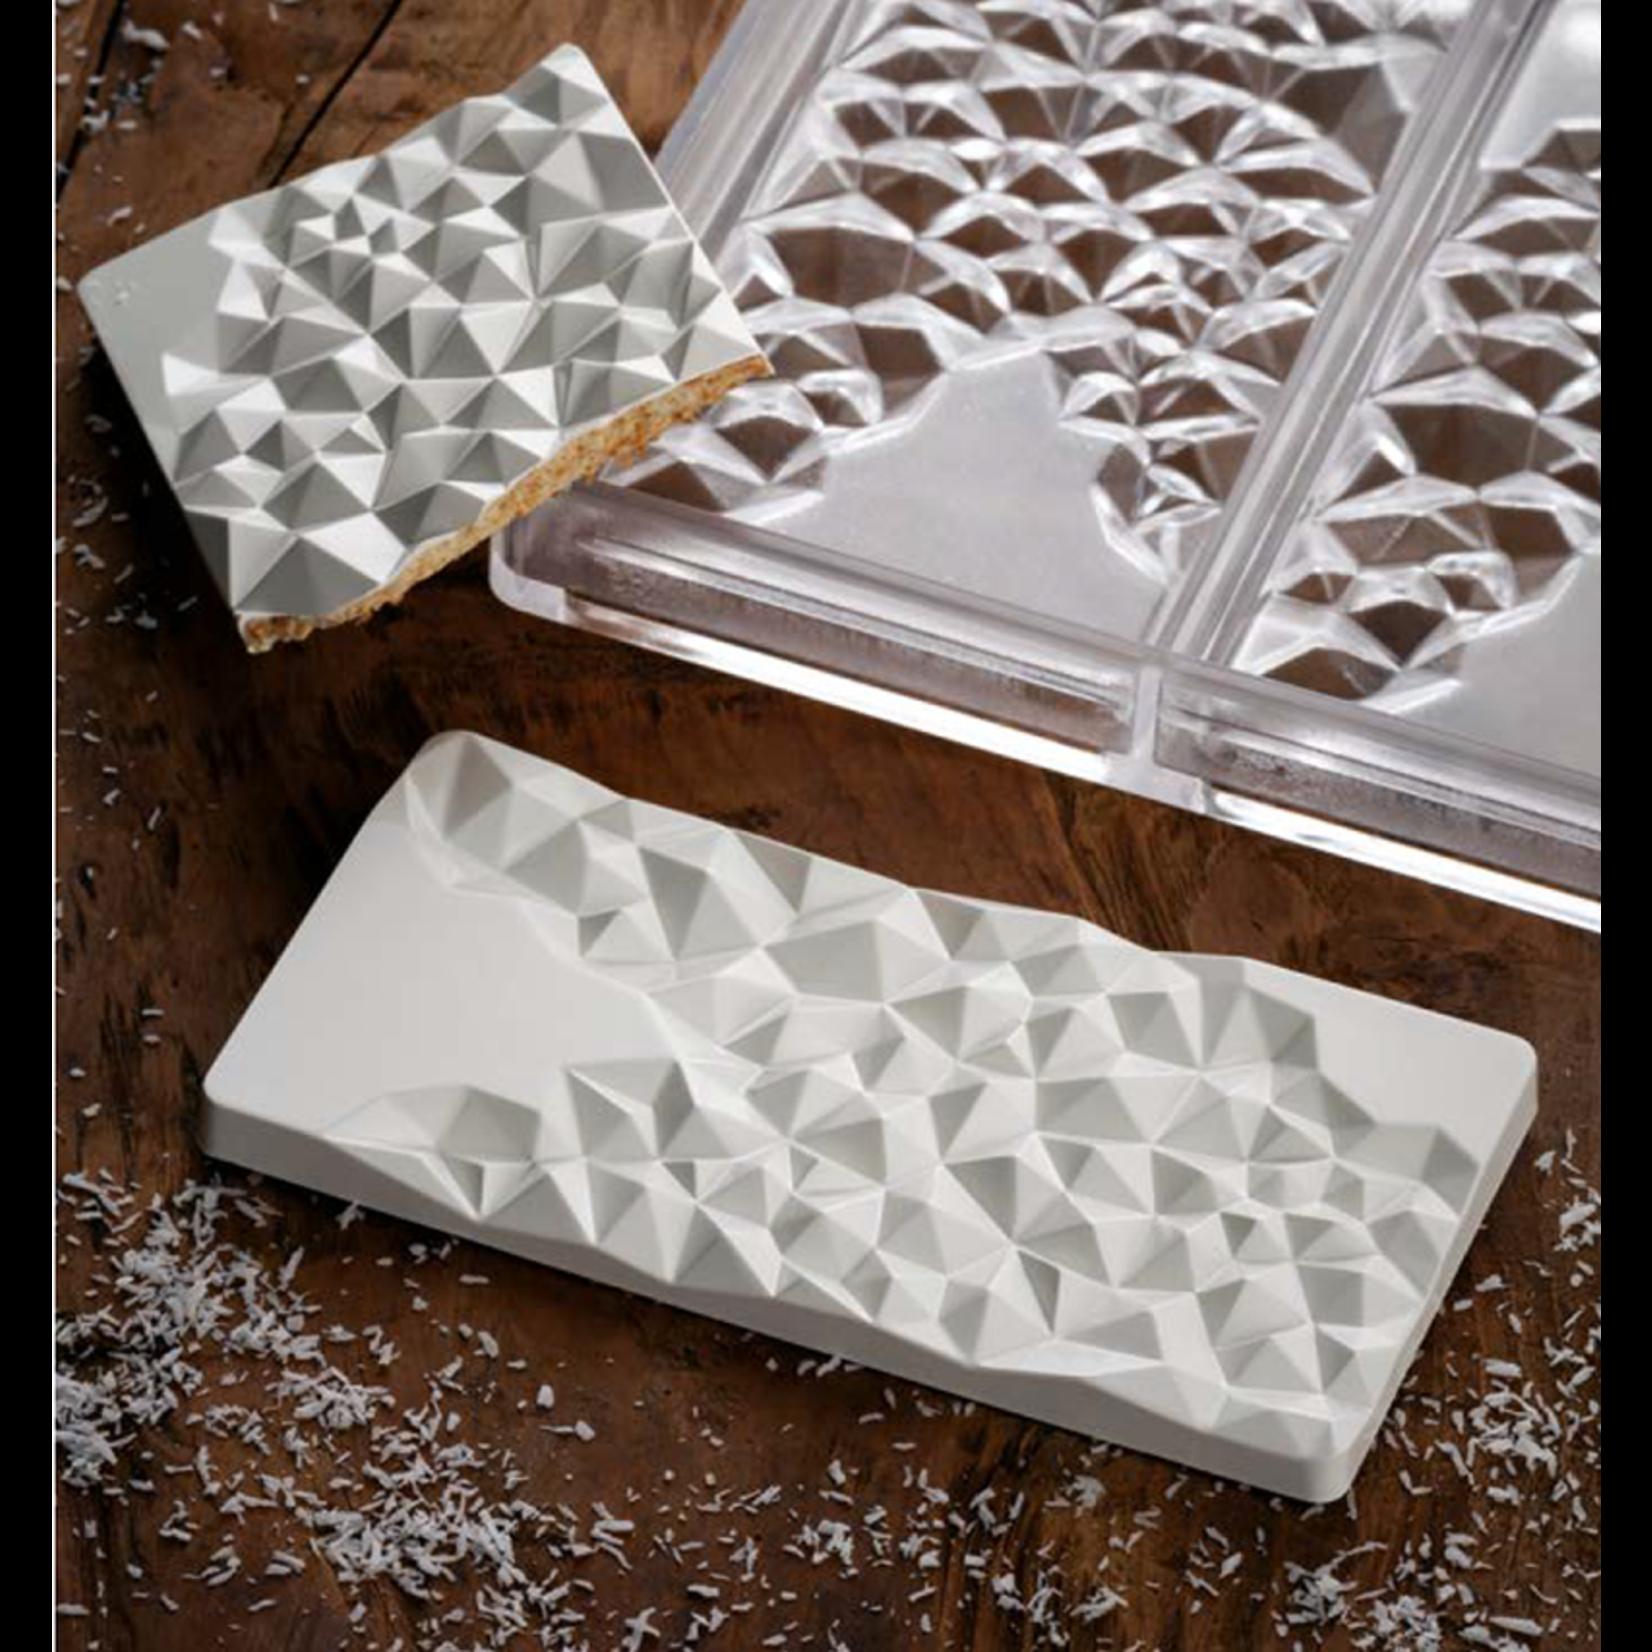 Pavoni Pavoni - Polycarbonate Chocolate Mold, Bar - Fragment, PC5004 (3 cavity)